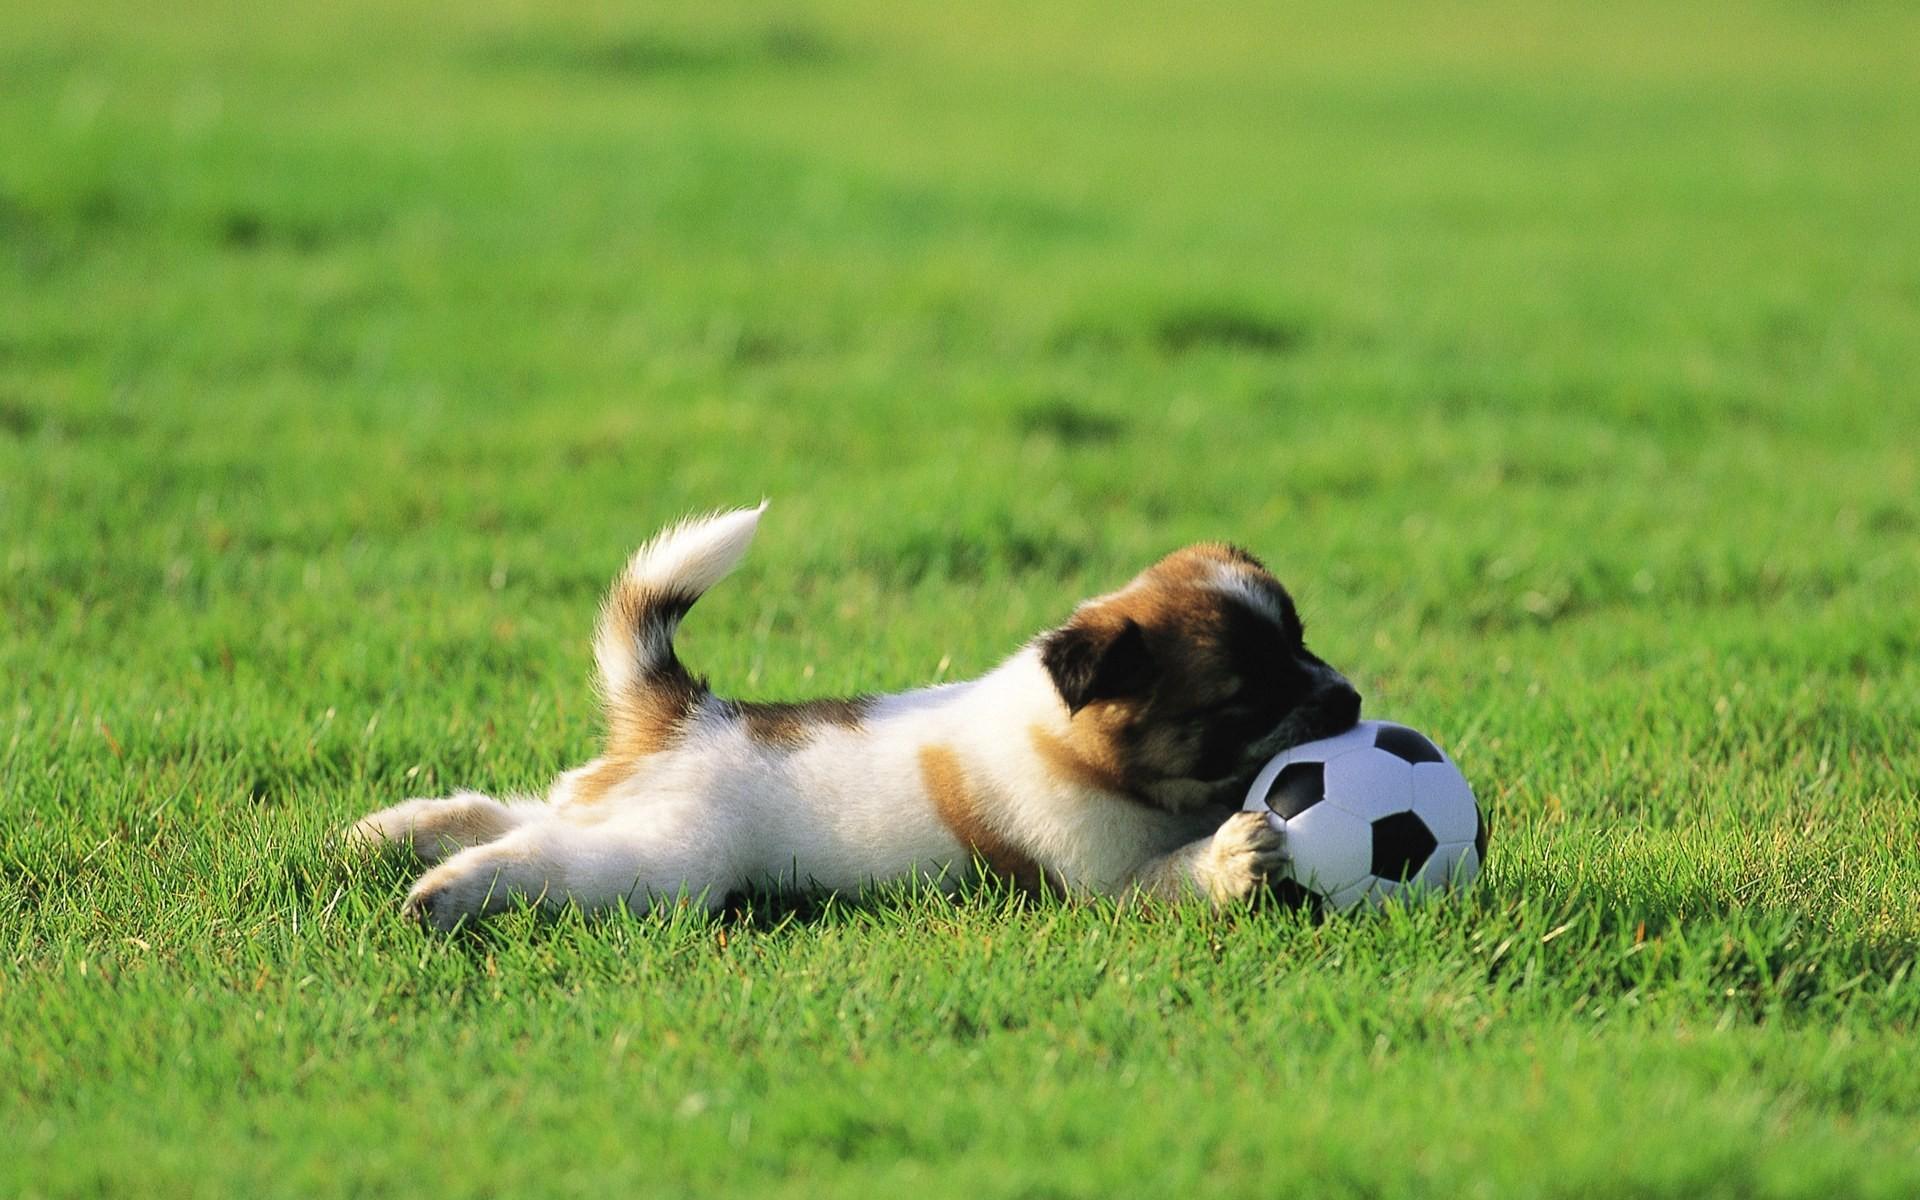 Perro jugando con pelota - 1920x1200